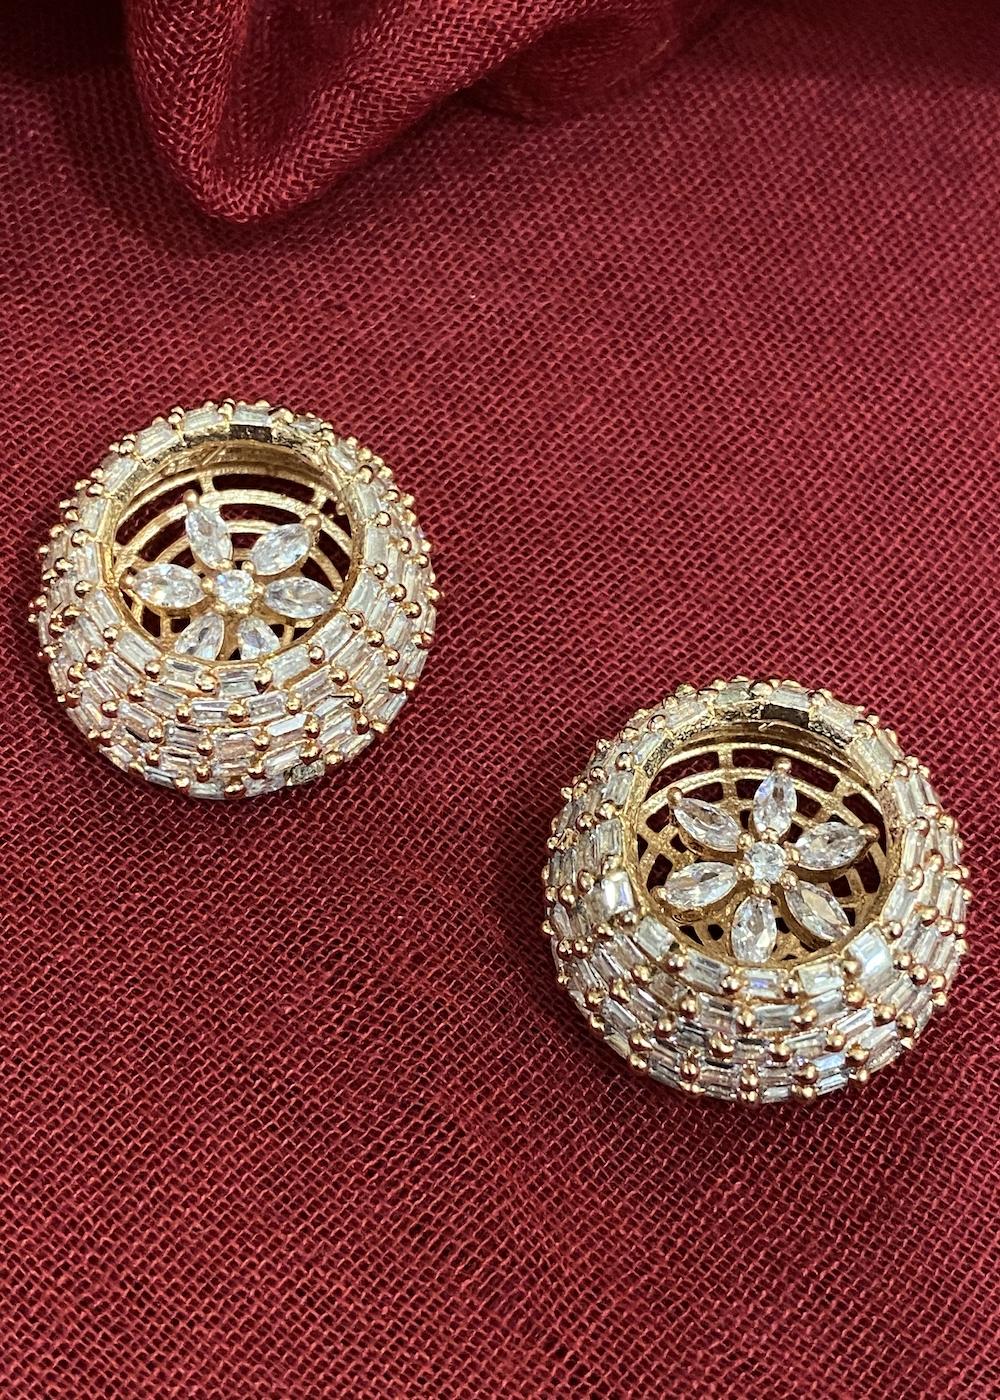 Swabhimann Jewellery | Swabhimann Jwellery Kamiara Zircon Flower Studs